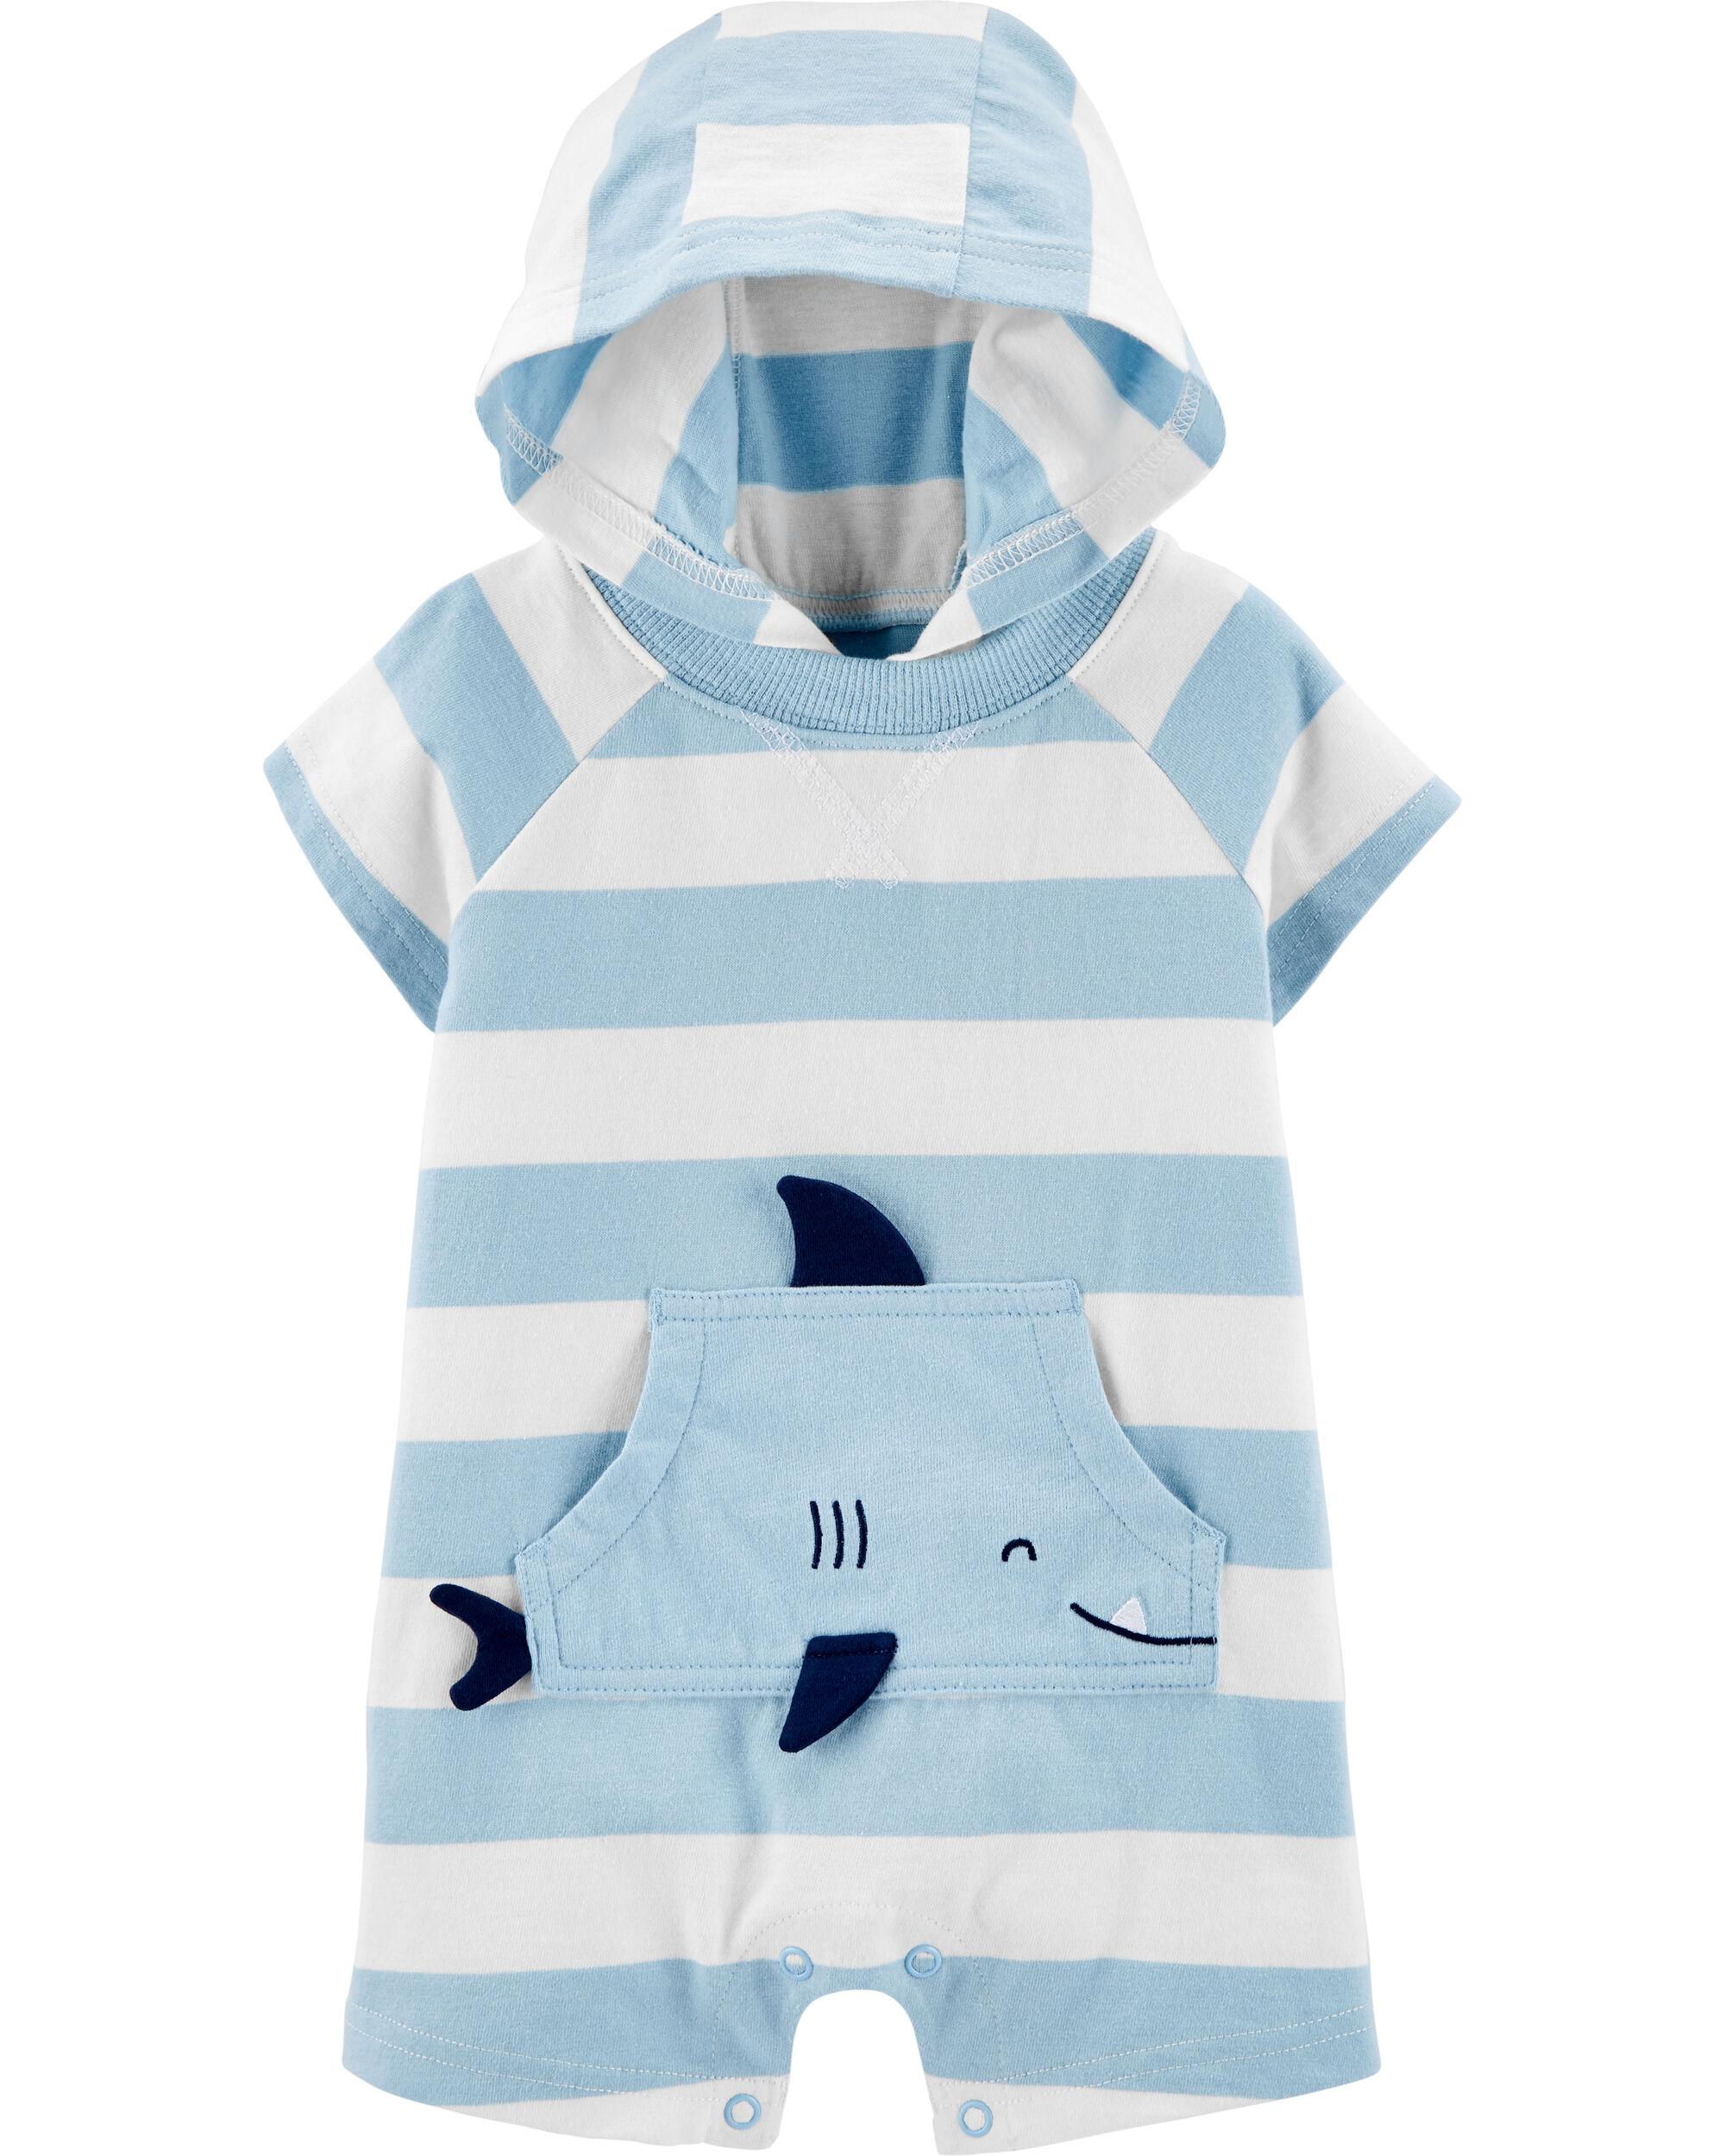 *CLEARANCE* Striped Shark Jersey Romper